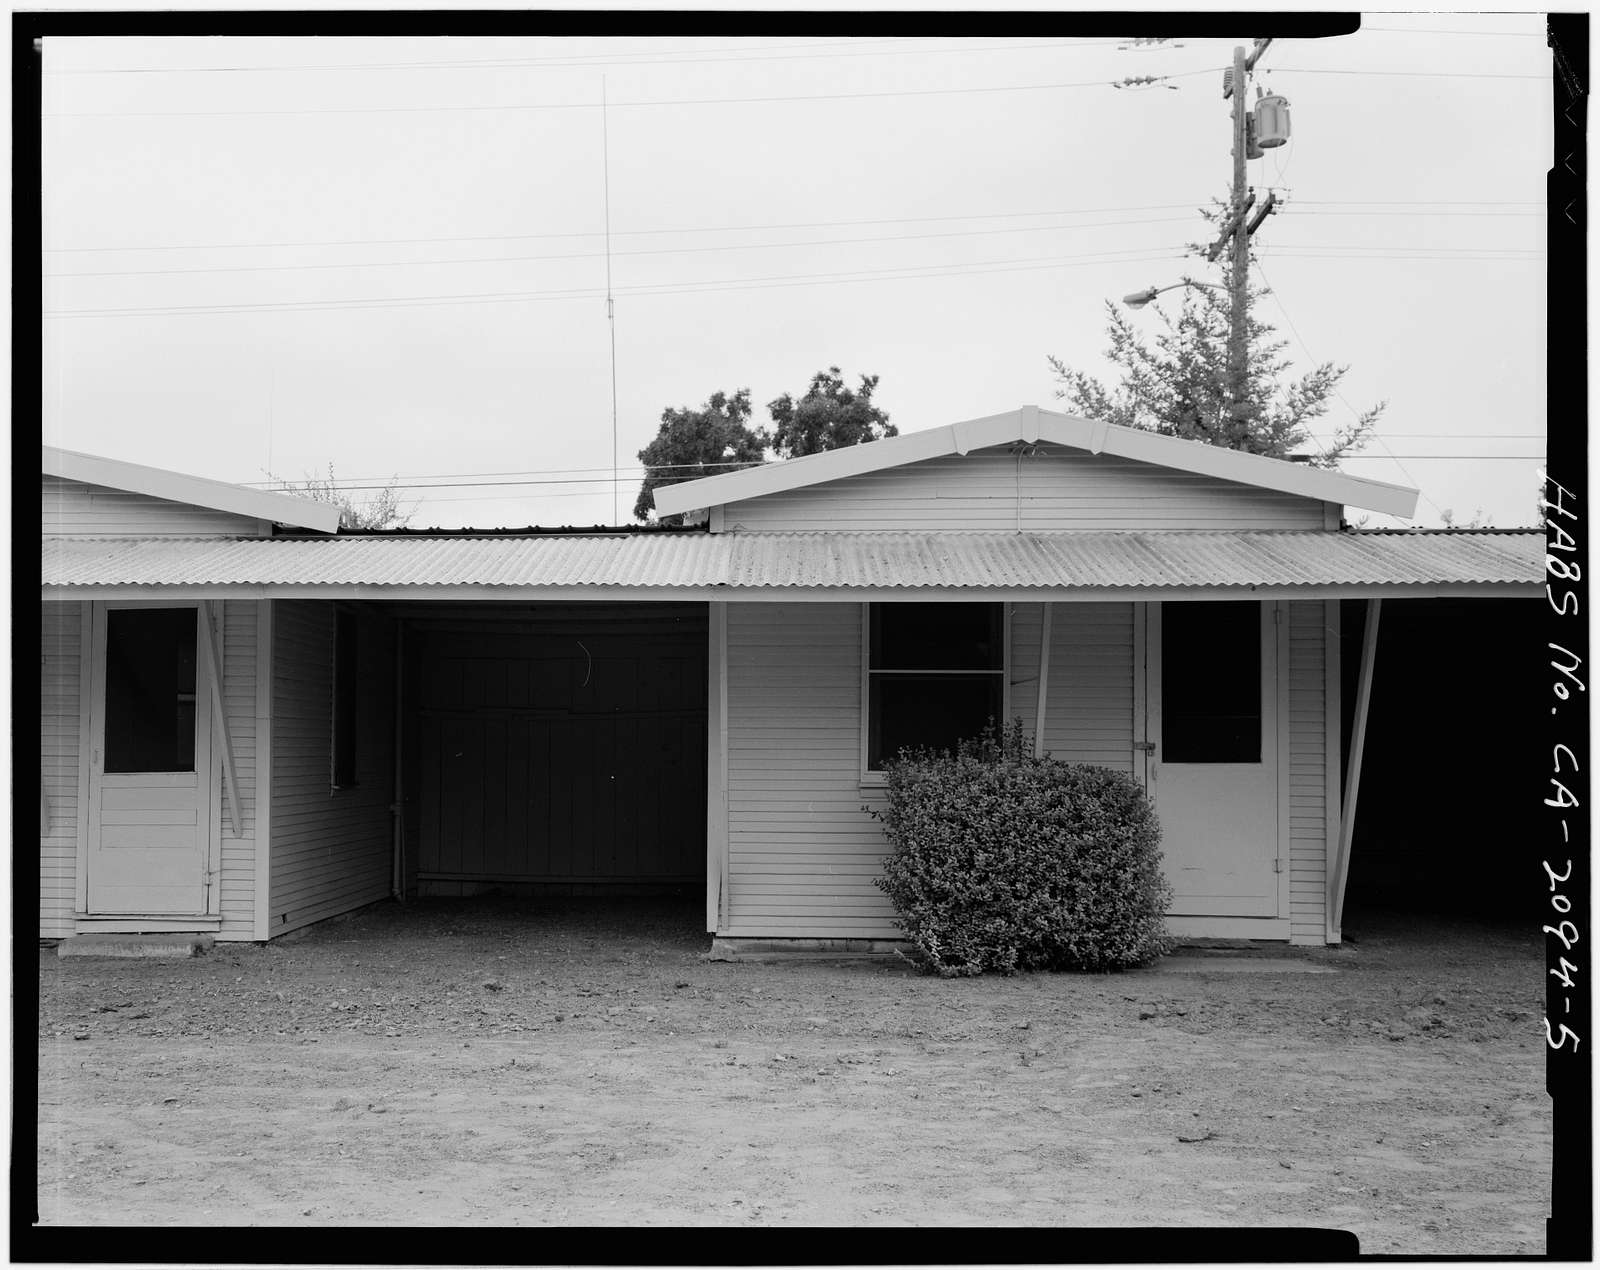 Lilly's Auto Camp, 8877 Monterey Highway, Gilroy, Santa Clara County, CA